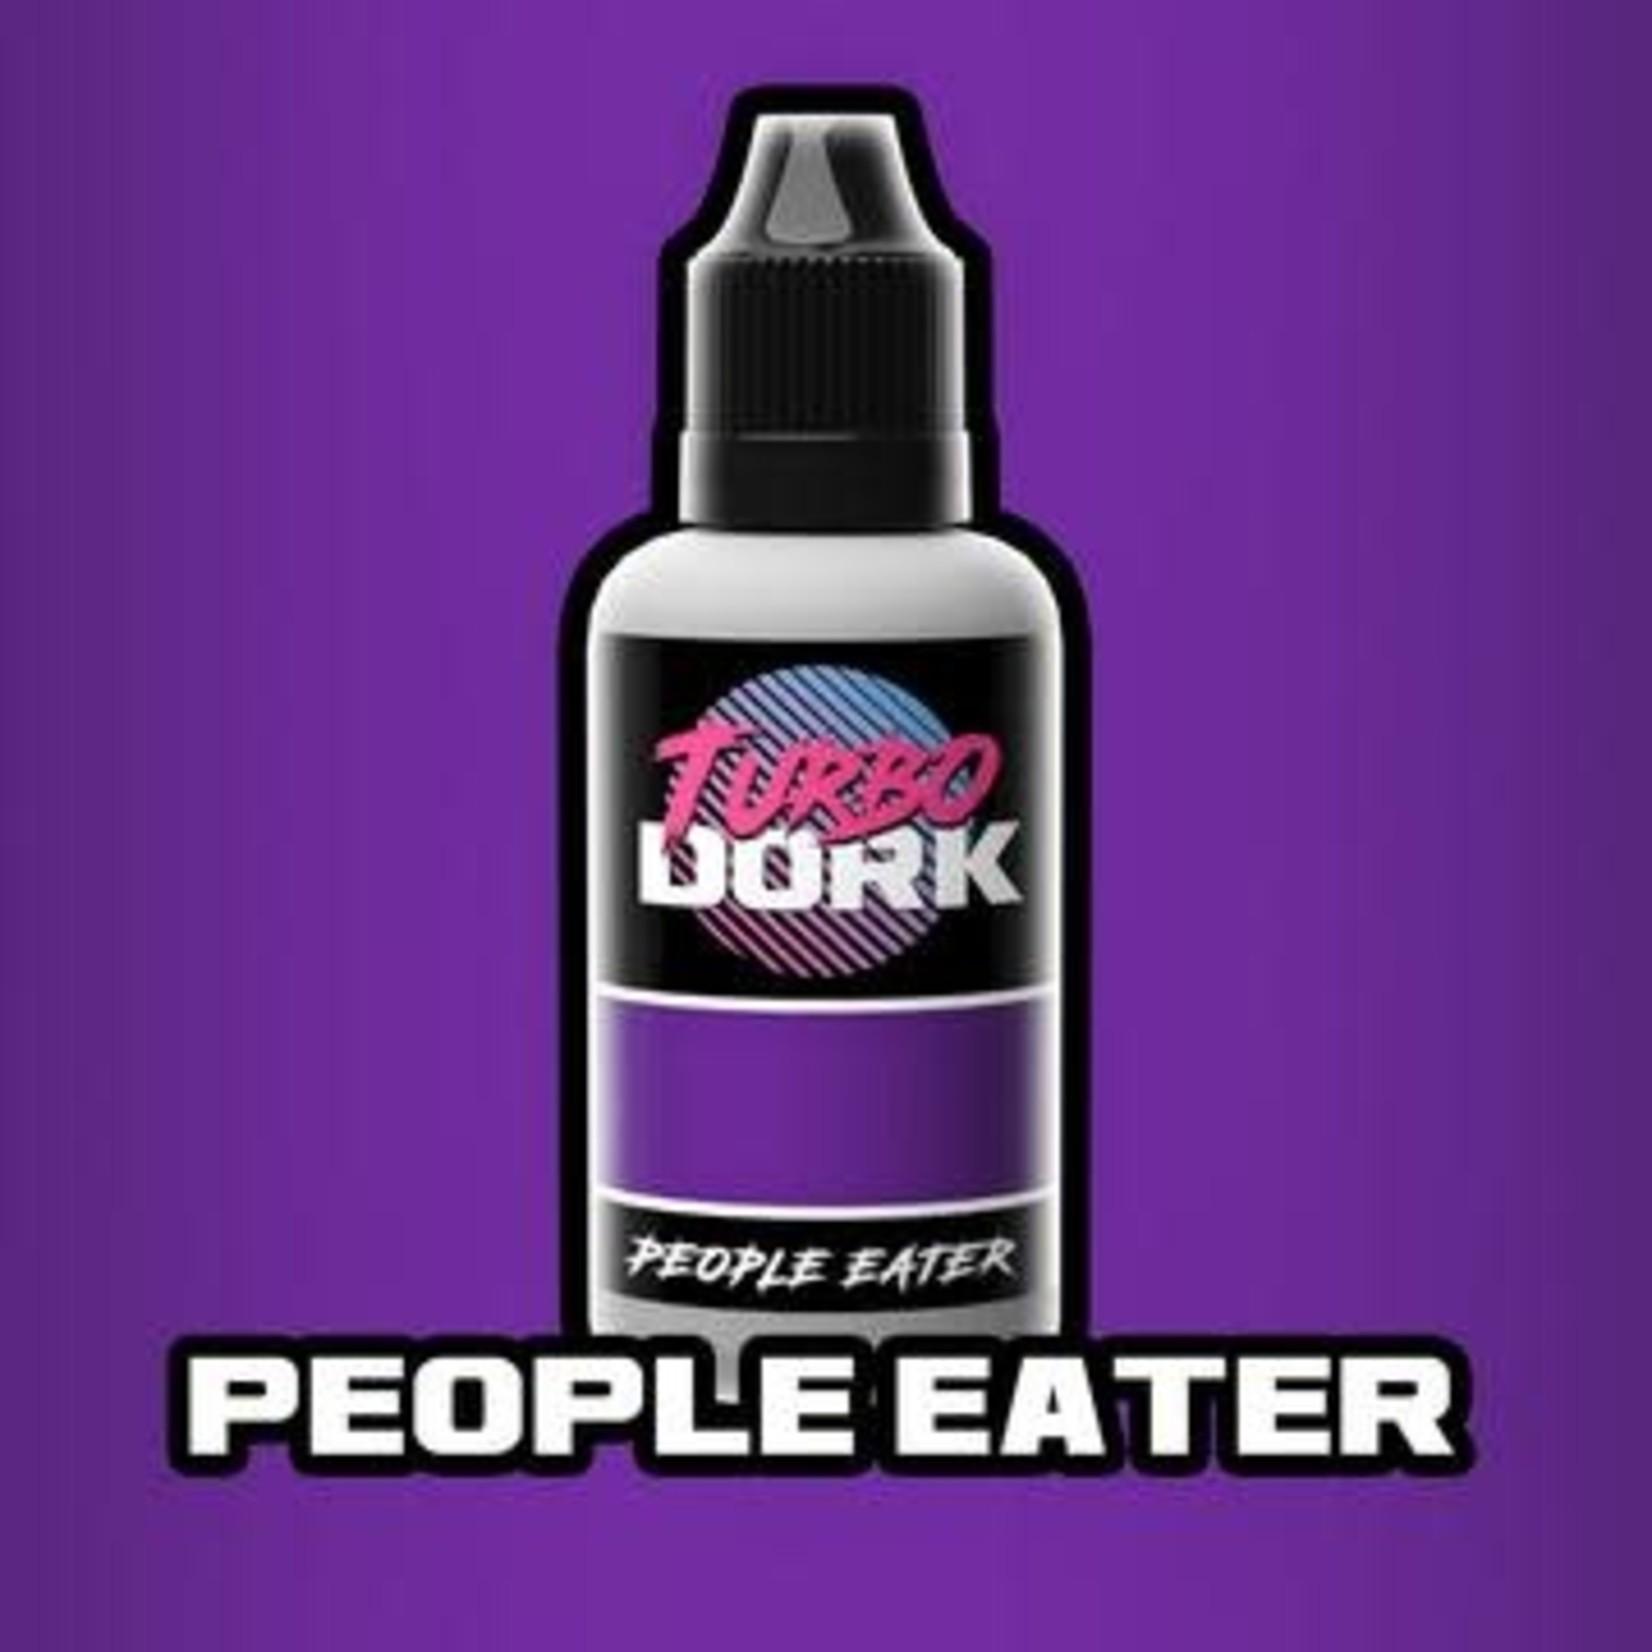 Turbo Dork Turbo Dork People Eater Metallic Acrylic Paint 20ml Bottle